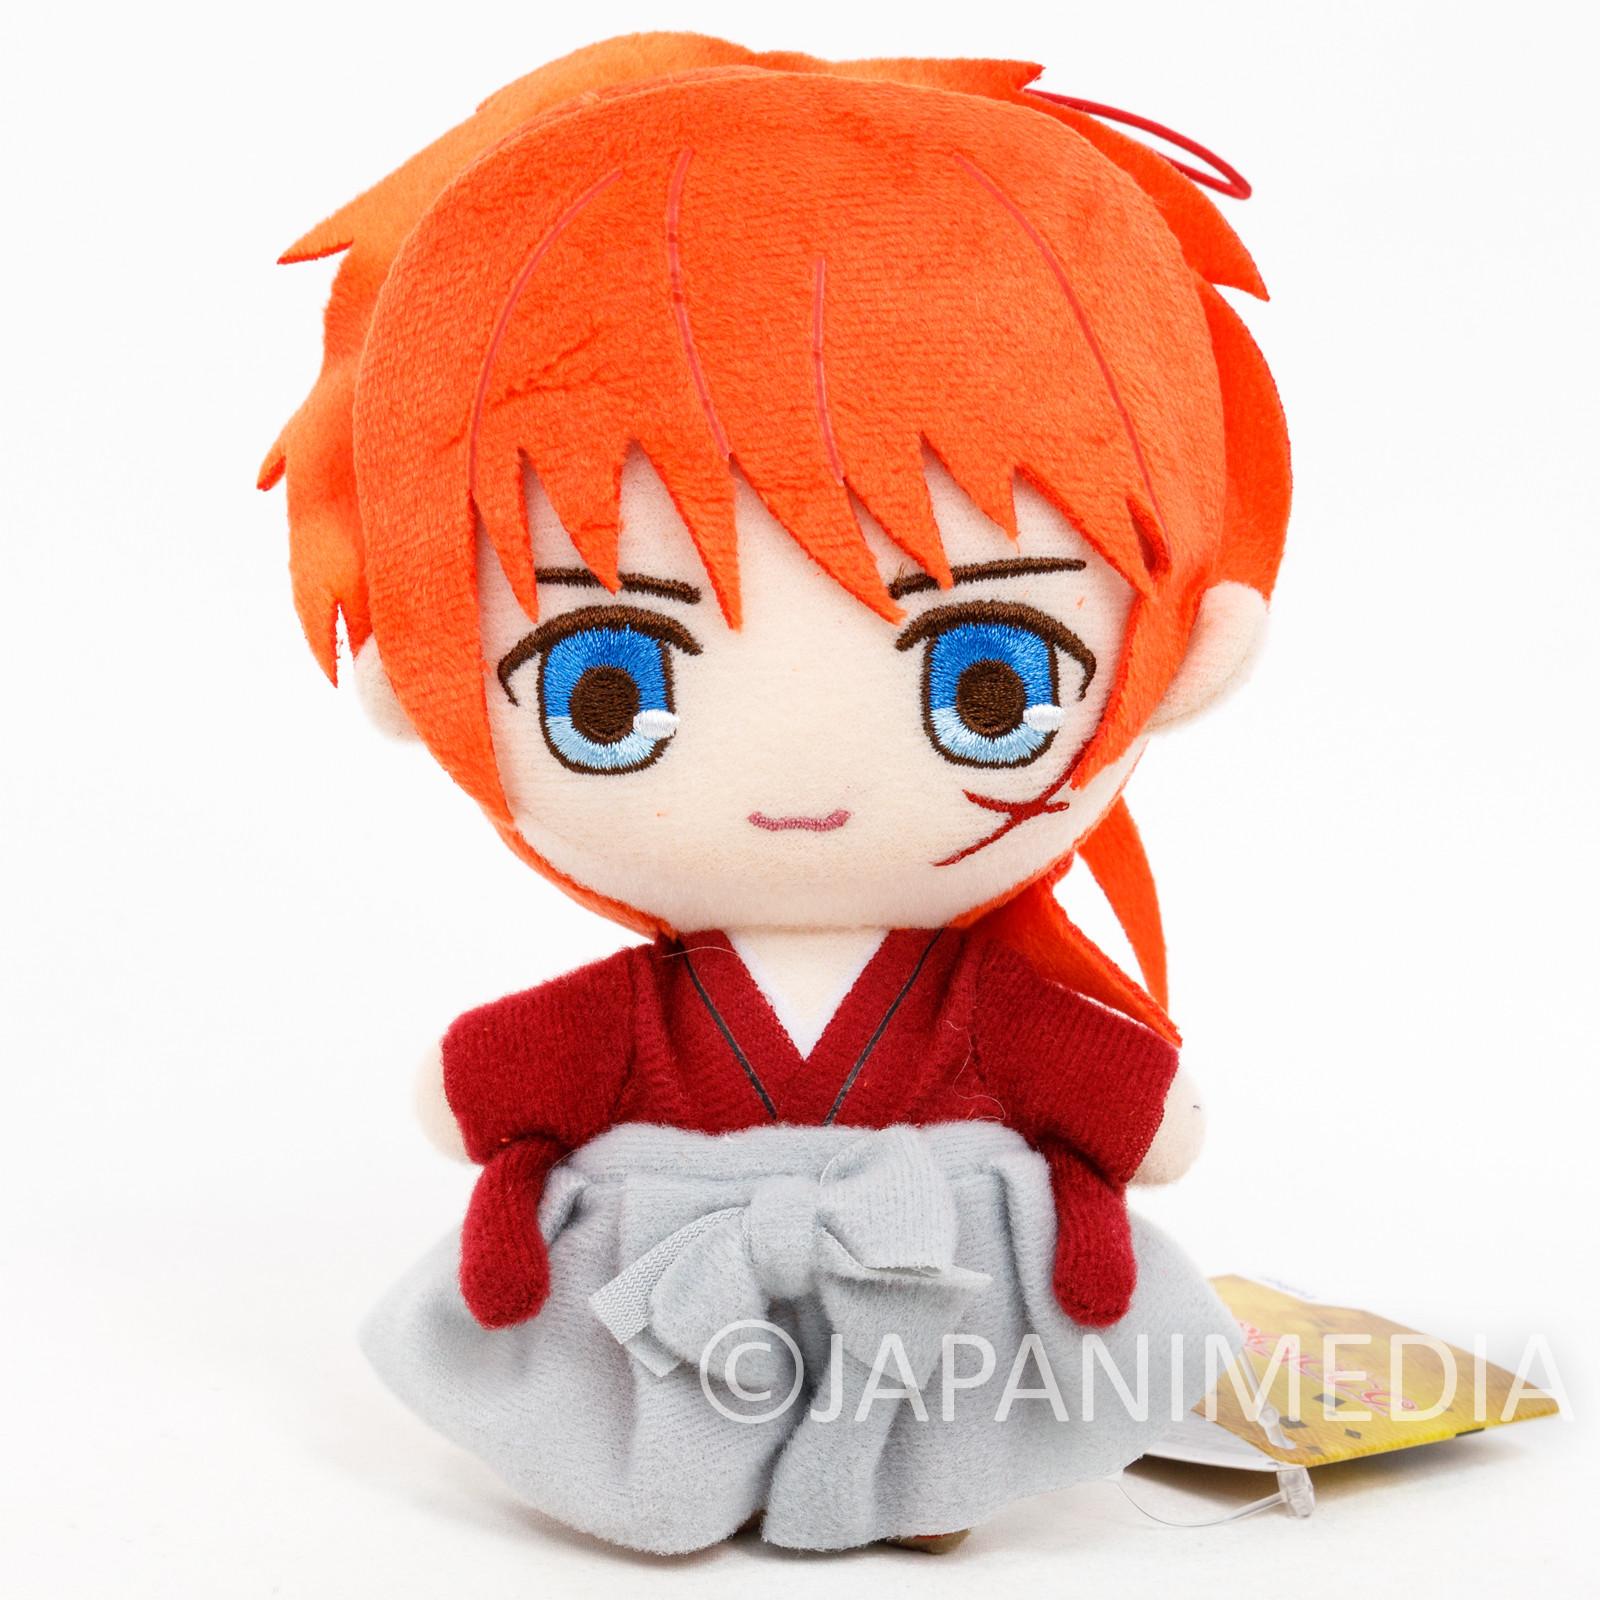 Rurouni Kenshin Kenshin Himuro Plush Doll w/Strap JAPAN ANIME